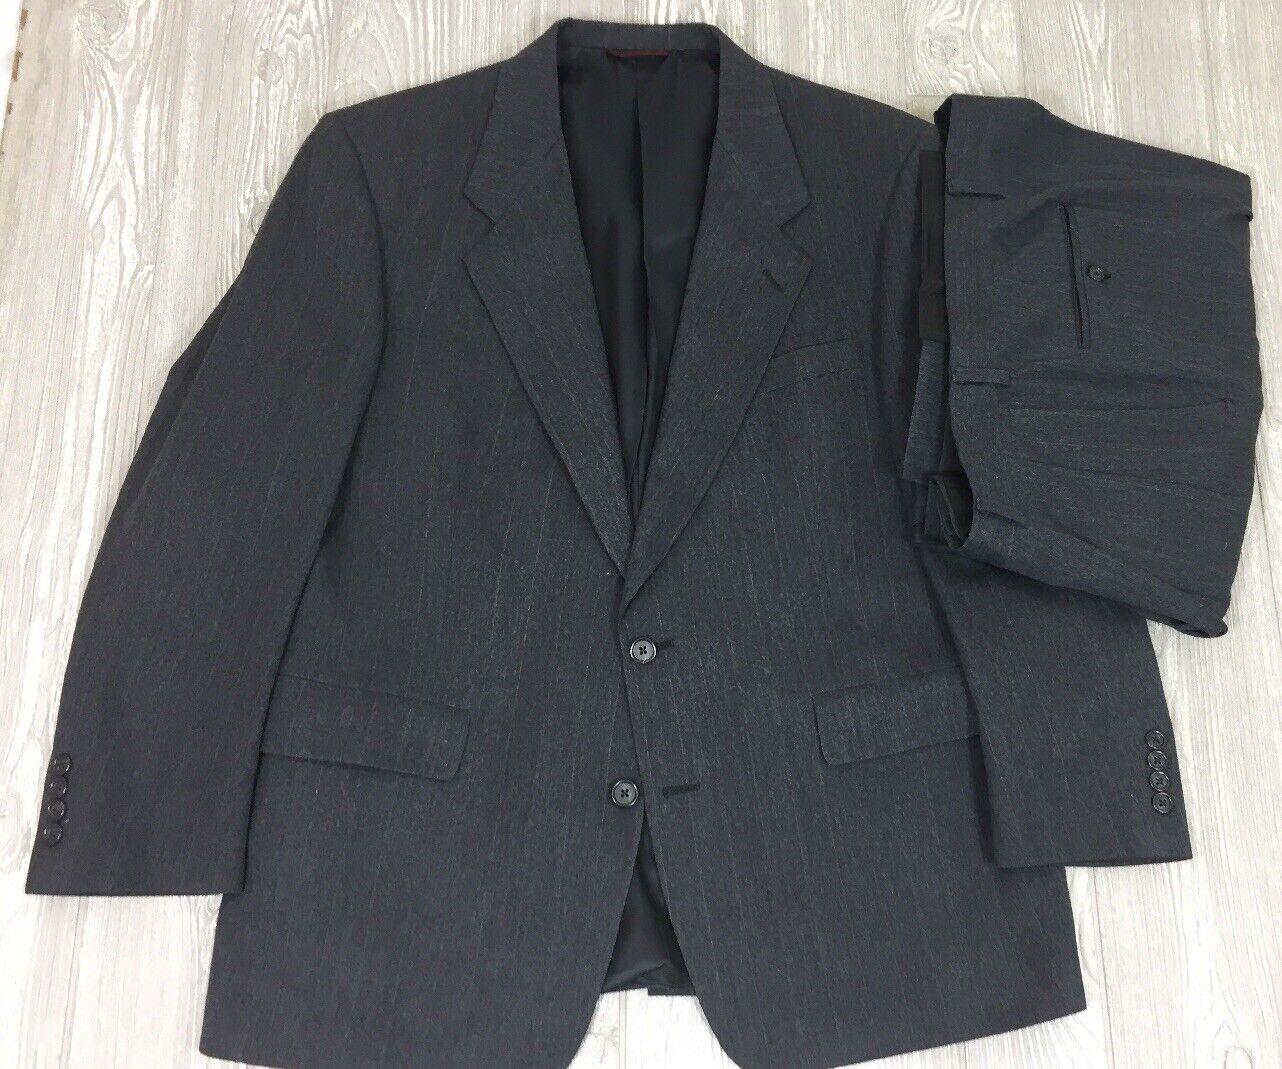 Vtg Hart Schaffner Marx Grey Striped Wool 2pc Suit 42 Short 38x28 (t9)